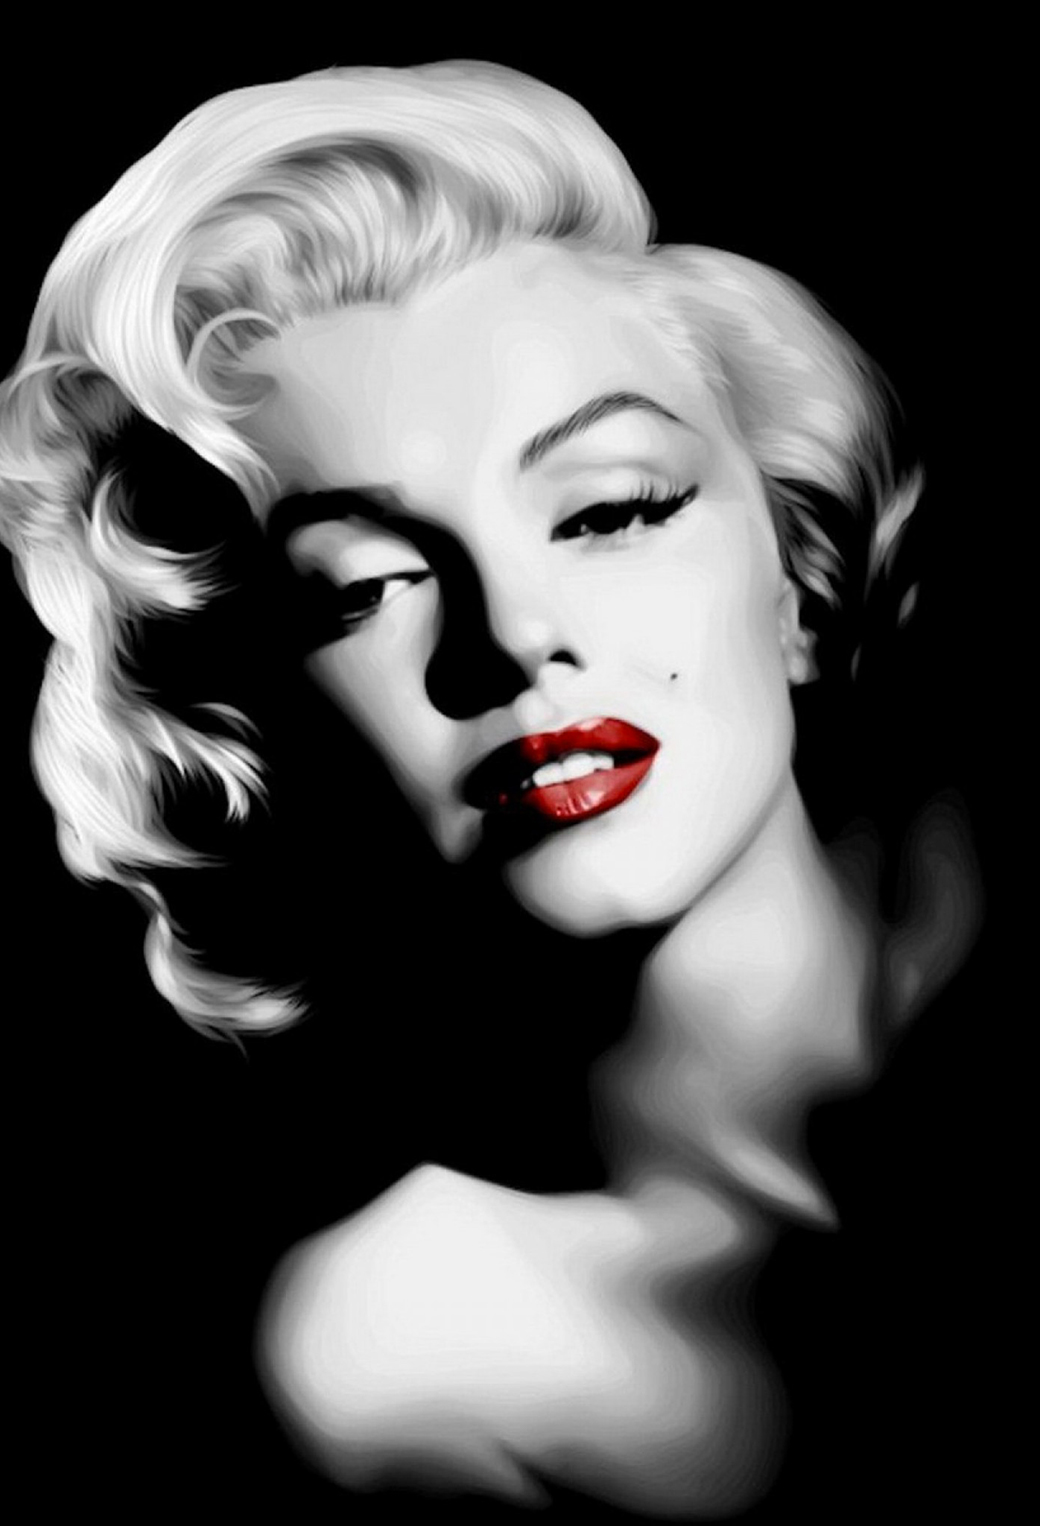 Marilyn Monroe in Dark Wallpaper for